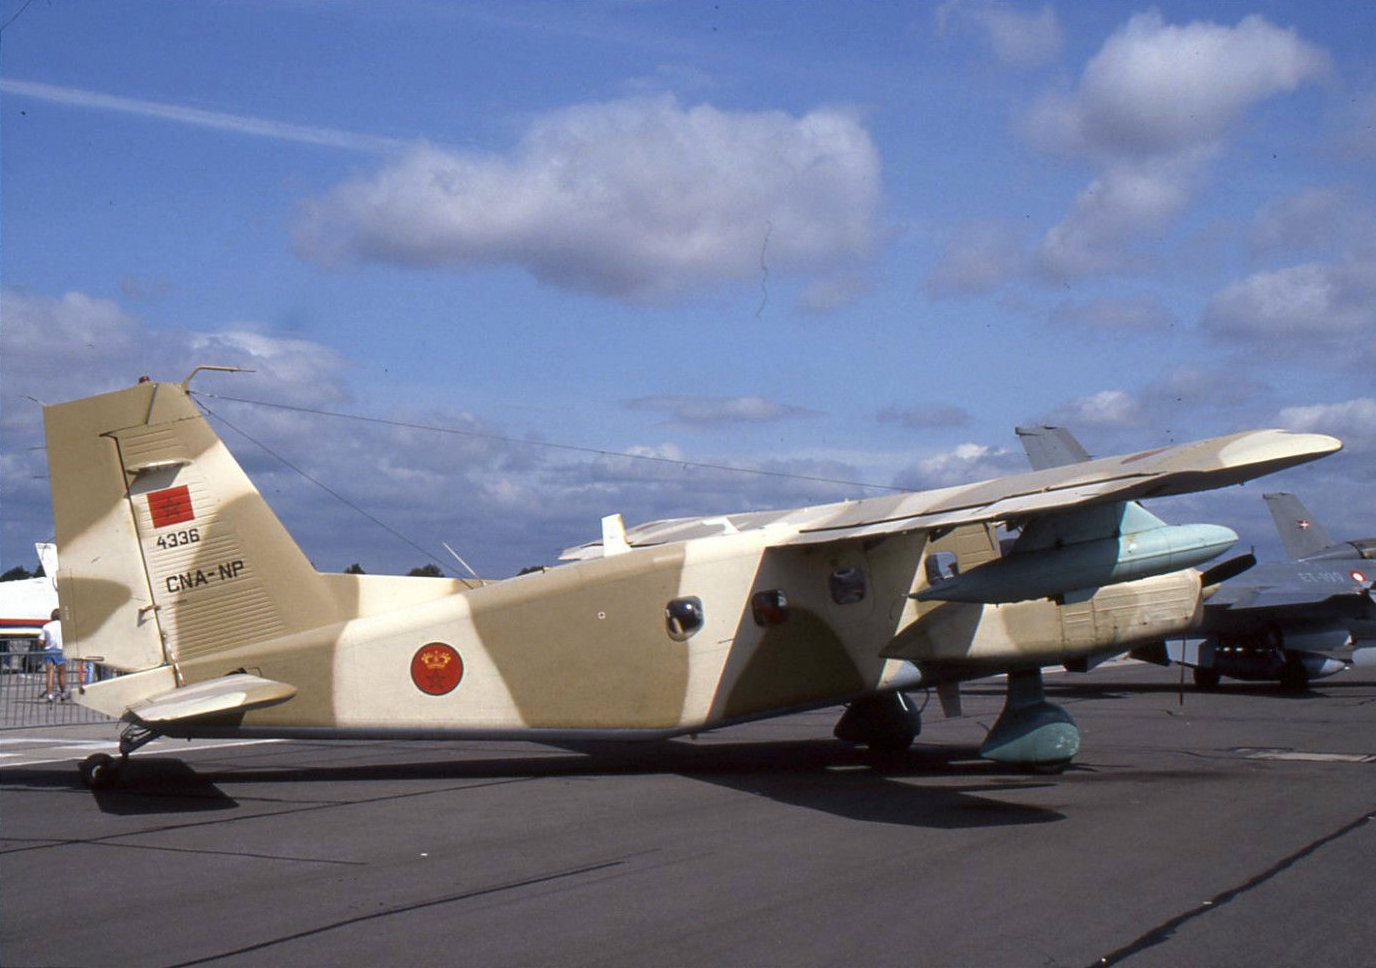 FRA: Photos anciens avions des FRA - Page 7 150715060239935701